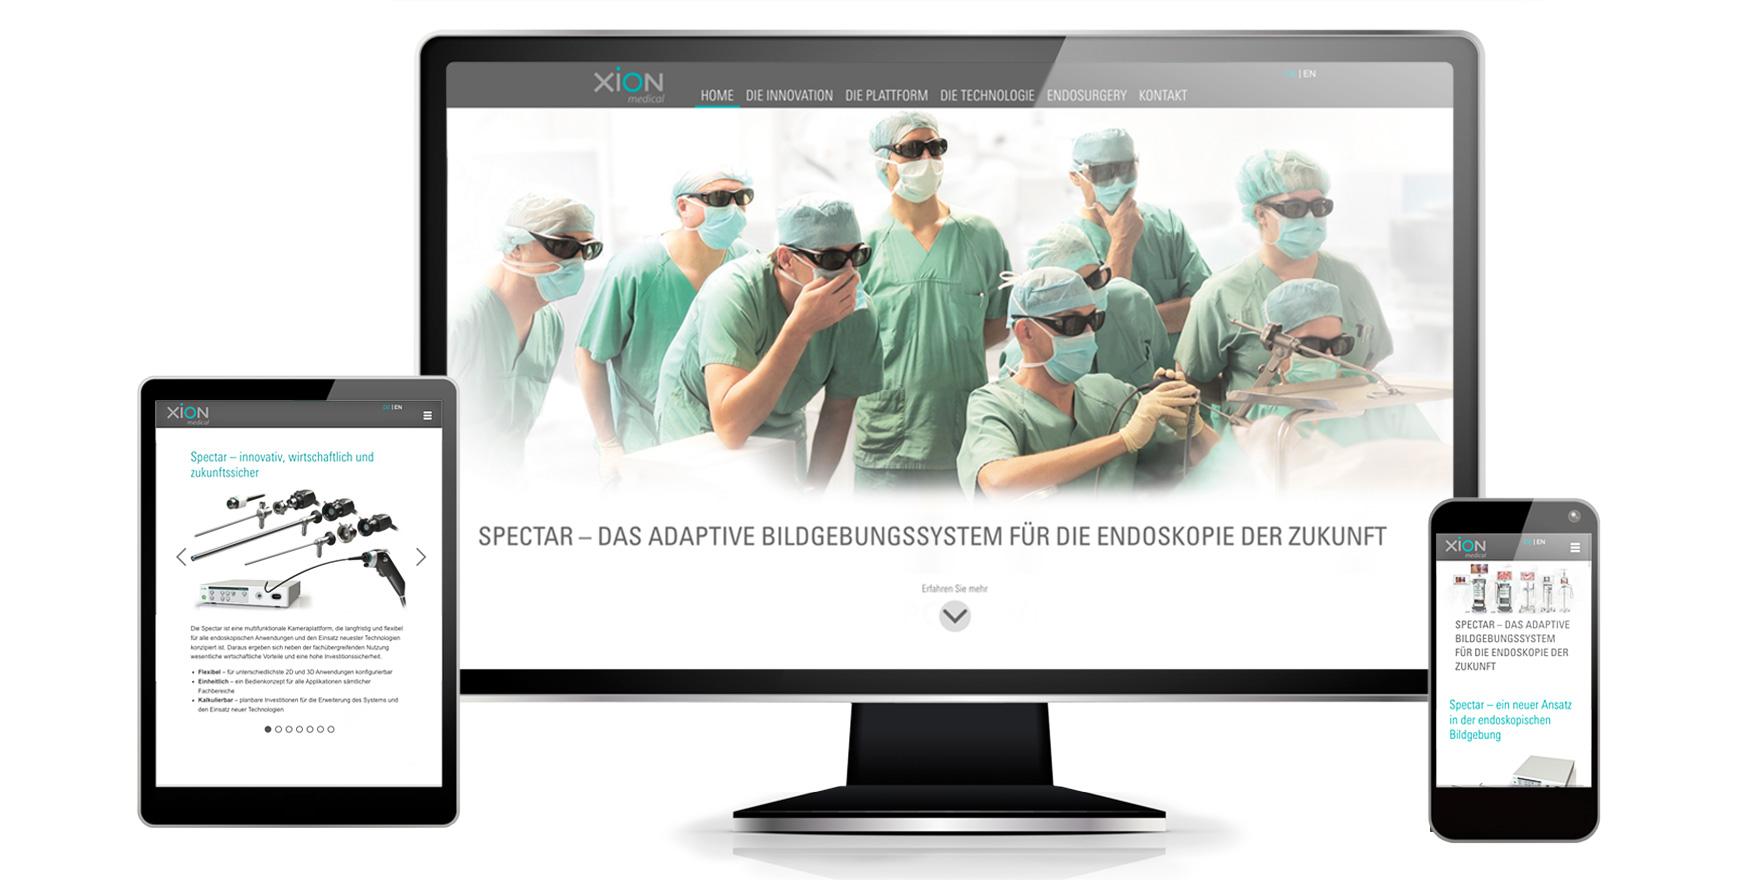 Website zum Produktlaunch - Markenbildung & Positionierung